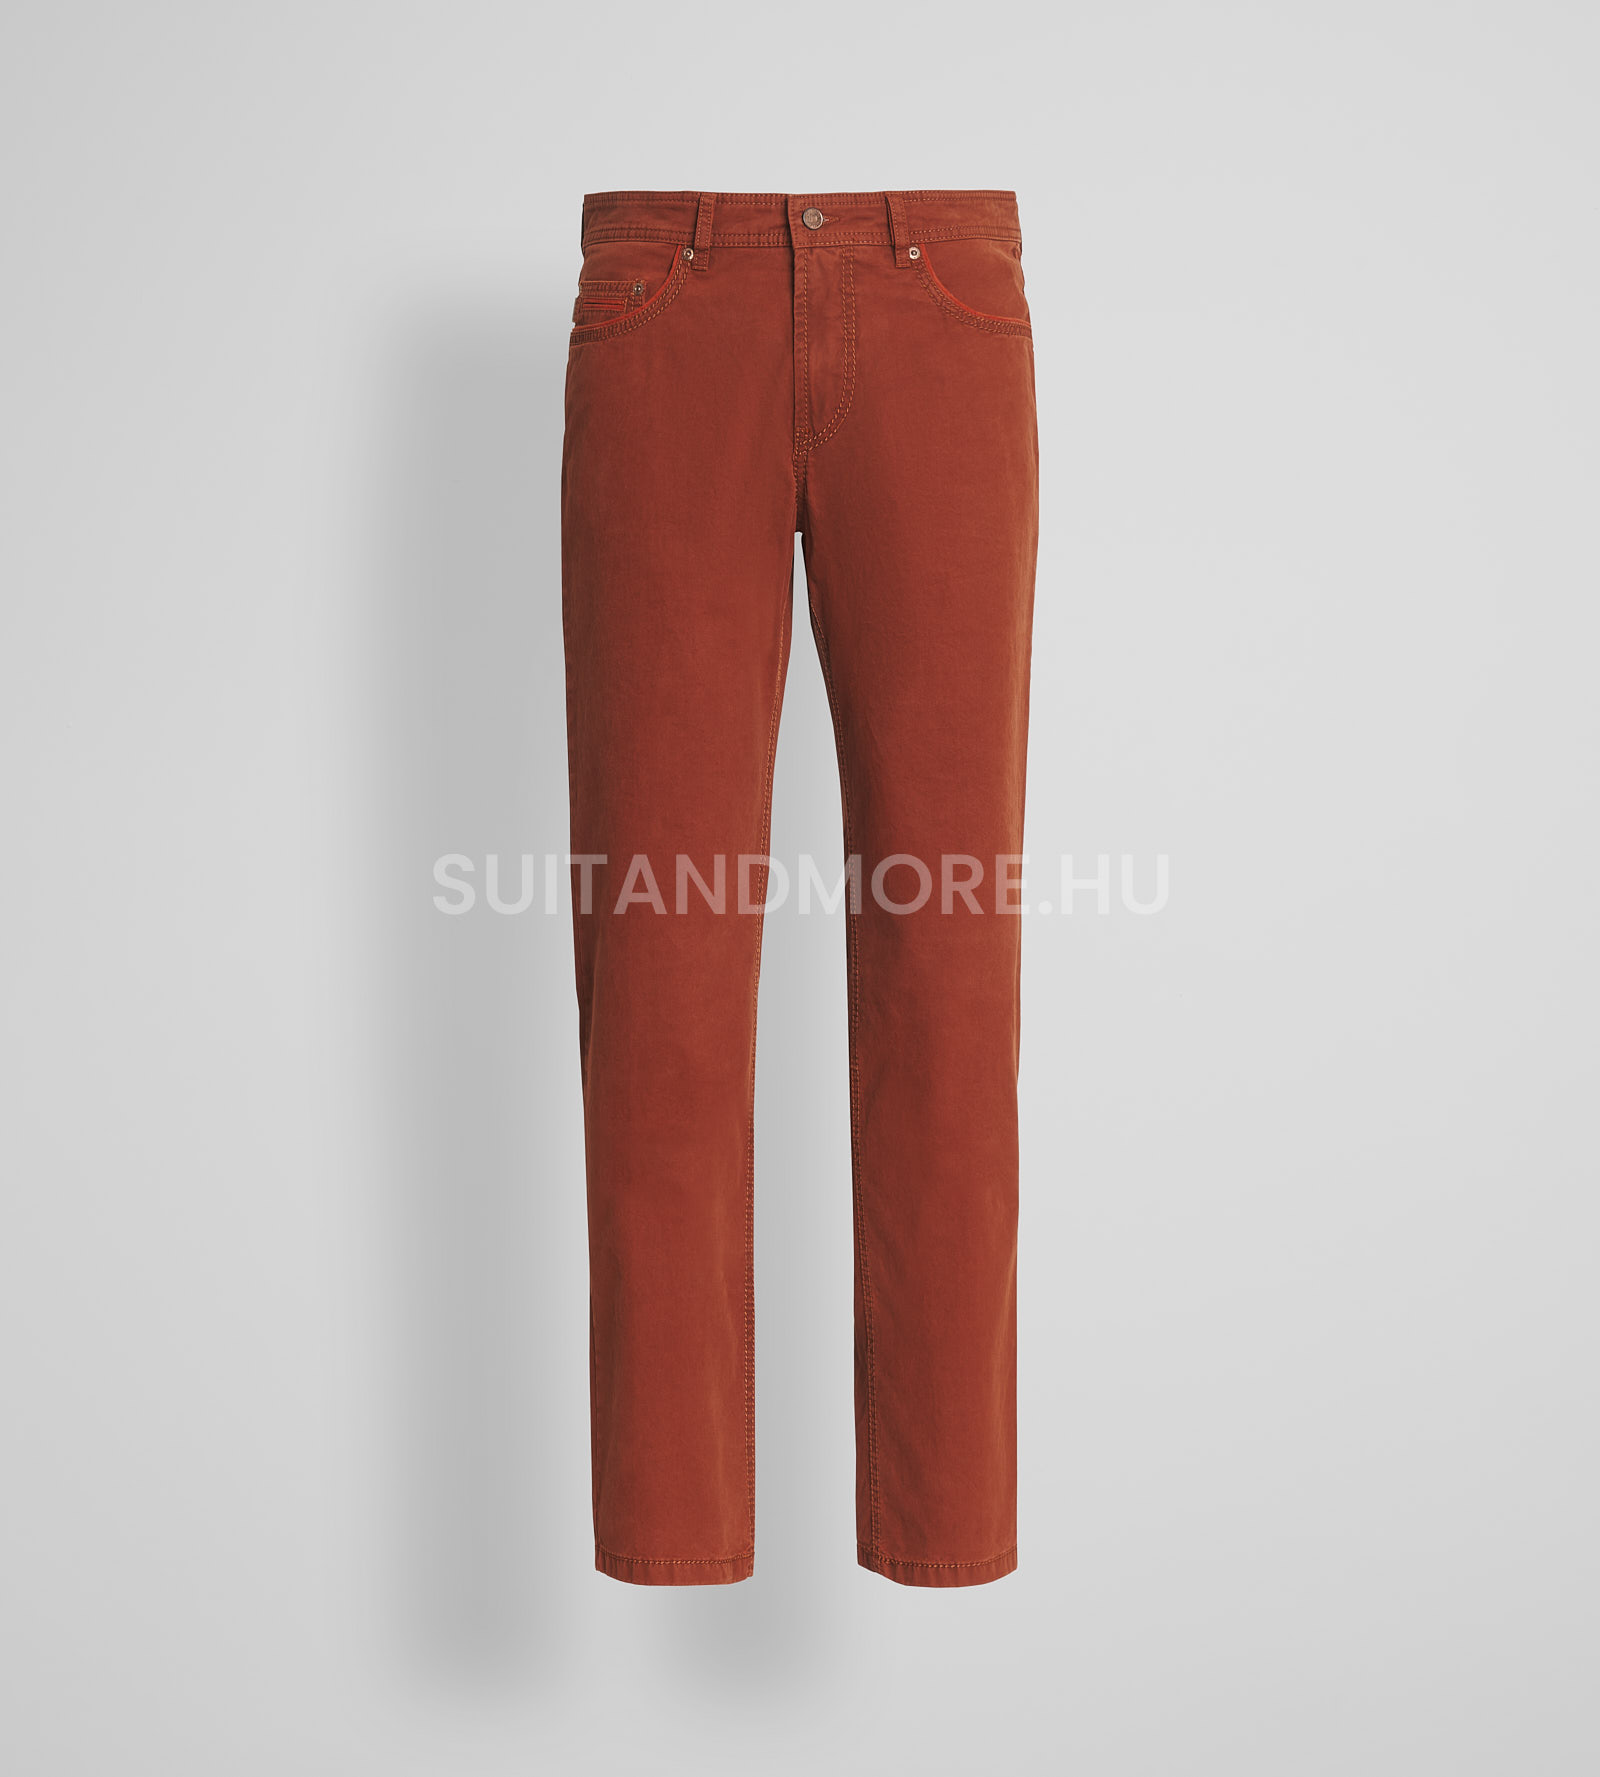 digel-narancssarga-modern-fit-pamut-sztreccs-farmernadrag-lino-f-1261548-92